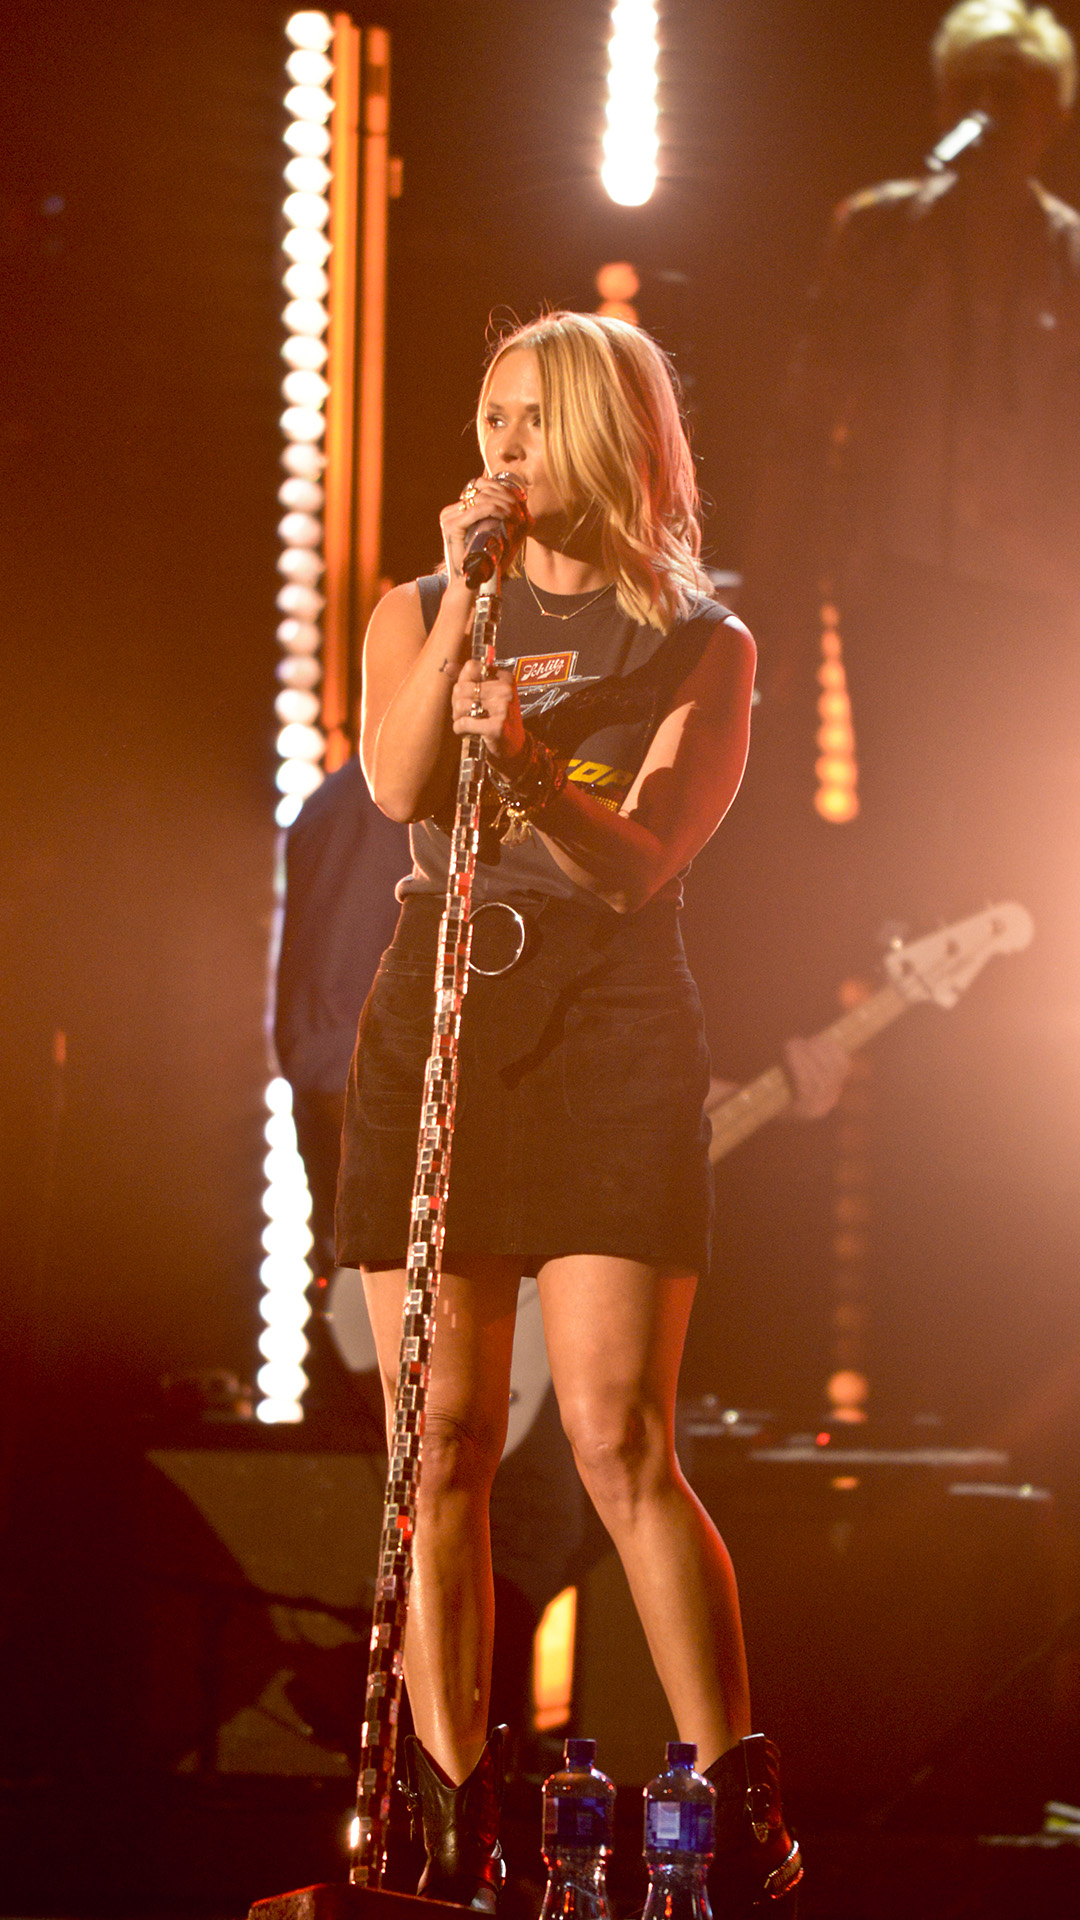 Miranda Lambert runs through her performance before the 2016 ACM Awards.